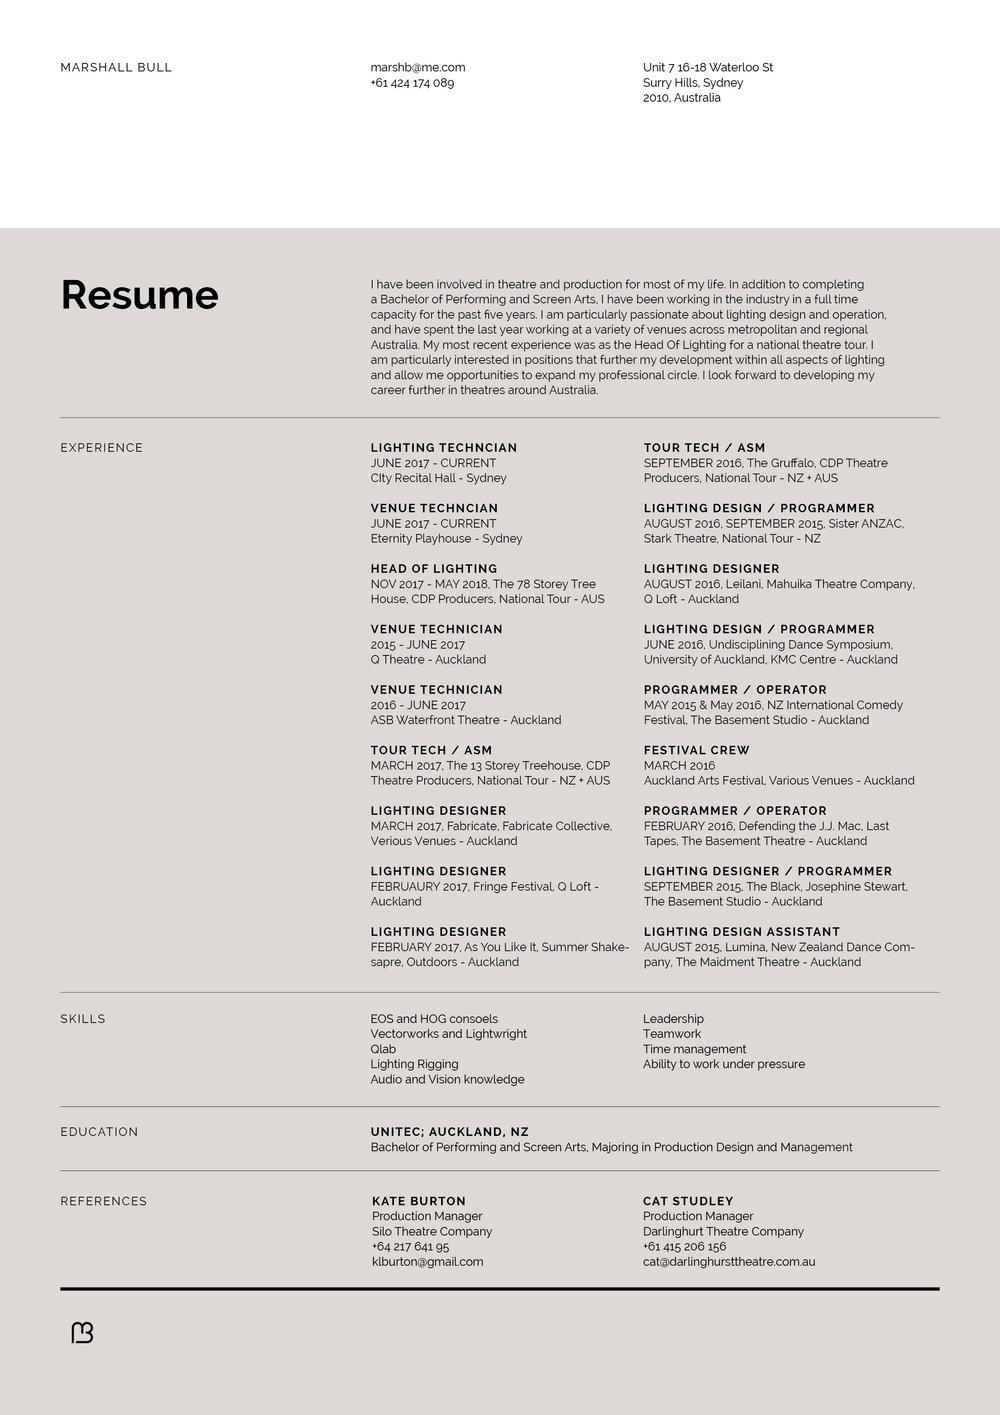 Marshall Bull Resume.jpg